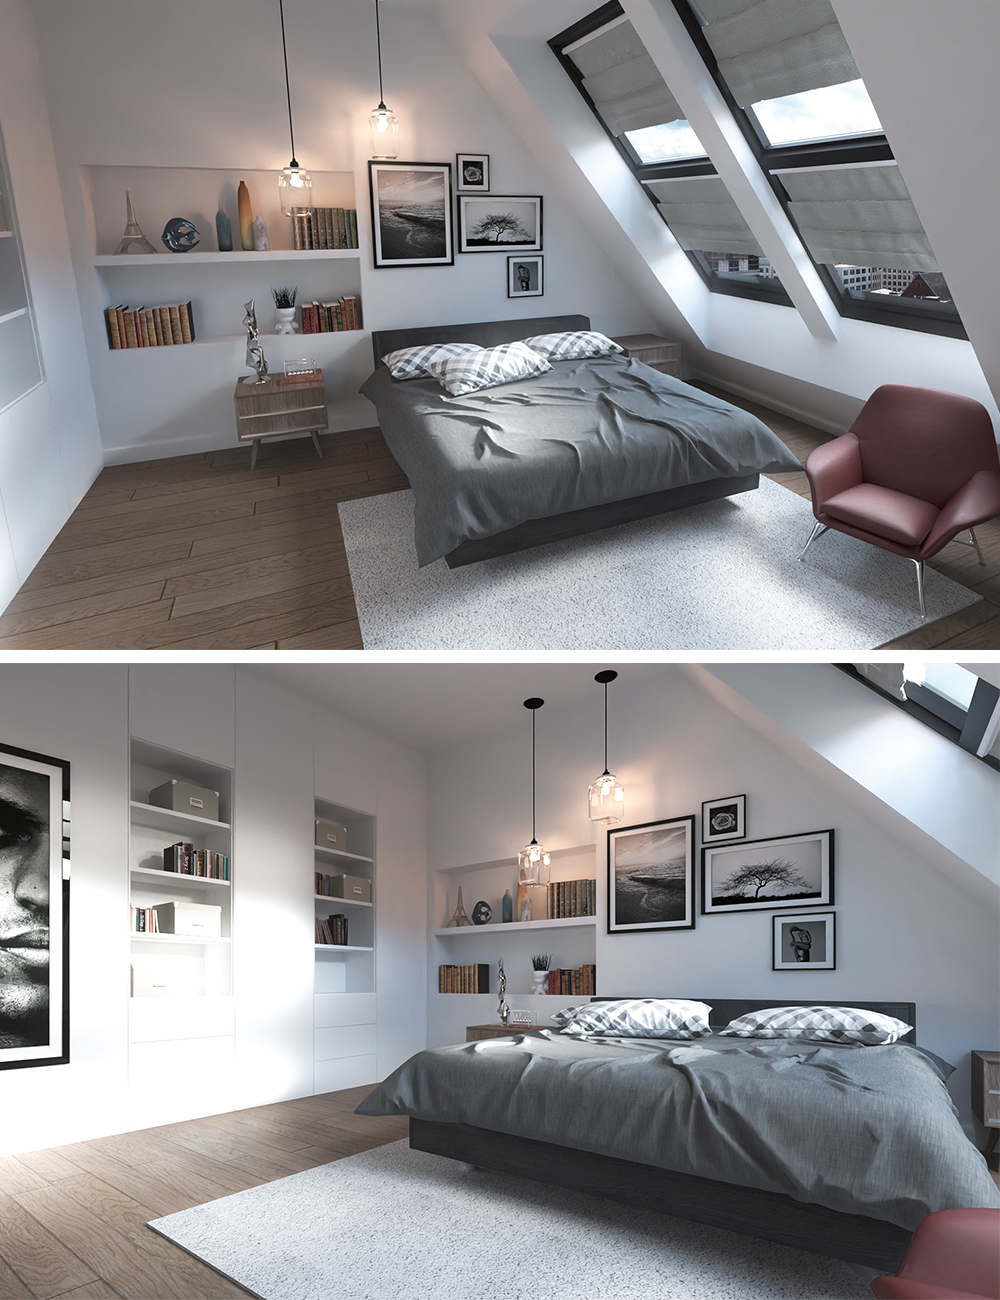 Attic Bedroom by: Digitallab3D, 3D Models by Daz 3D